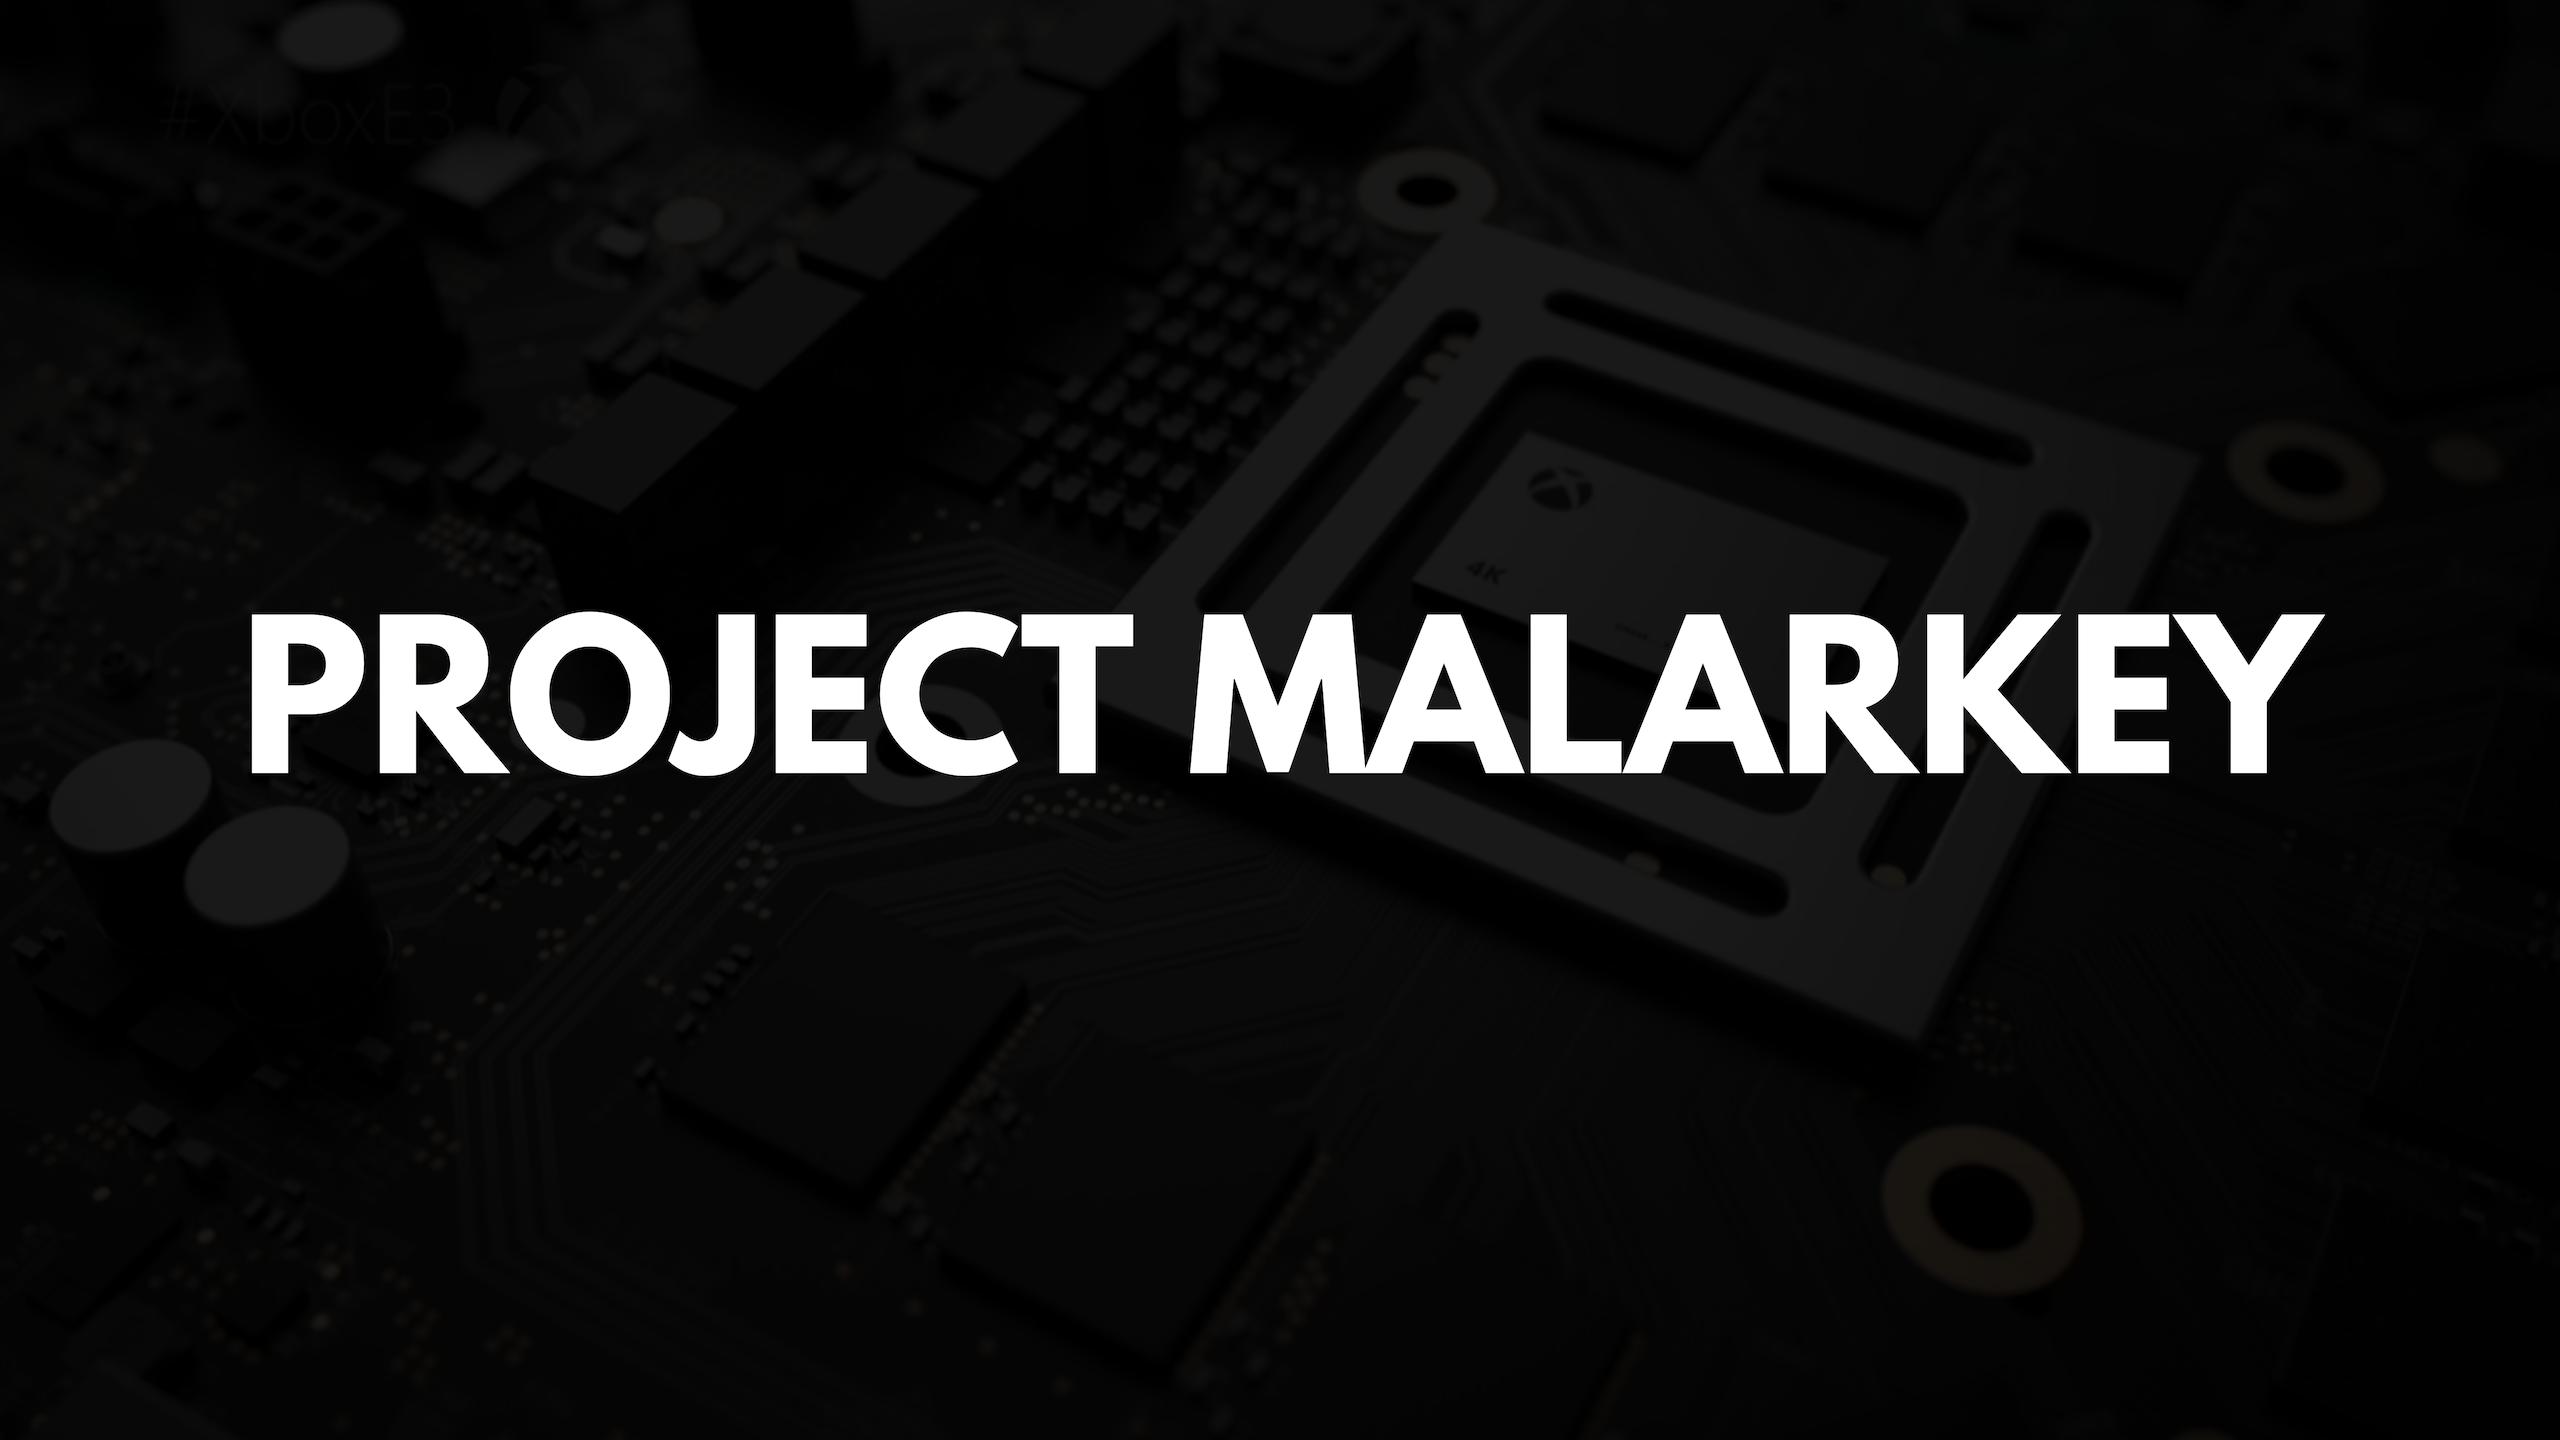 Project malarkey  1